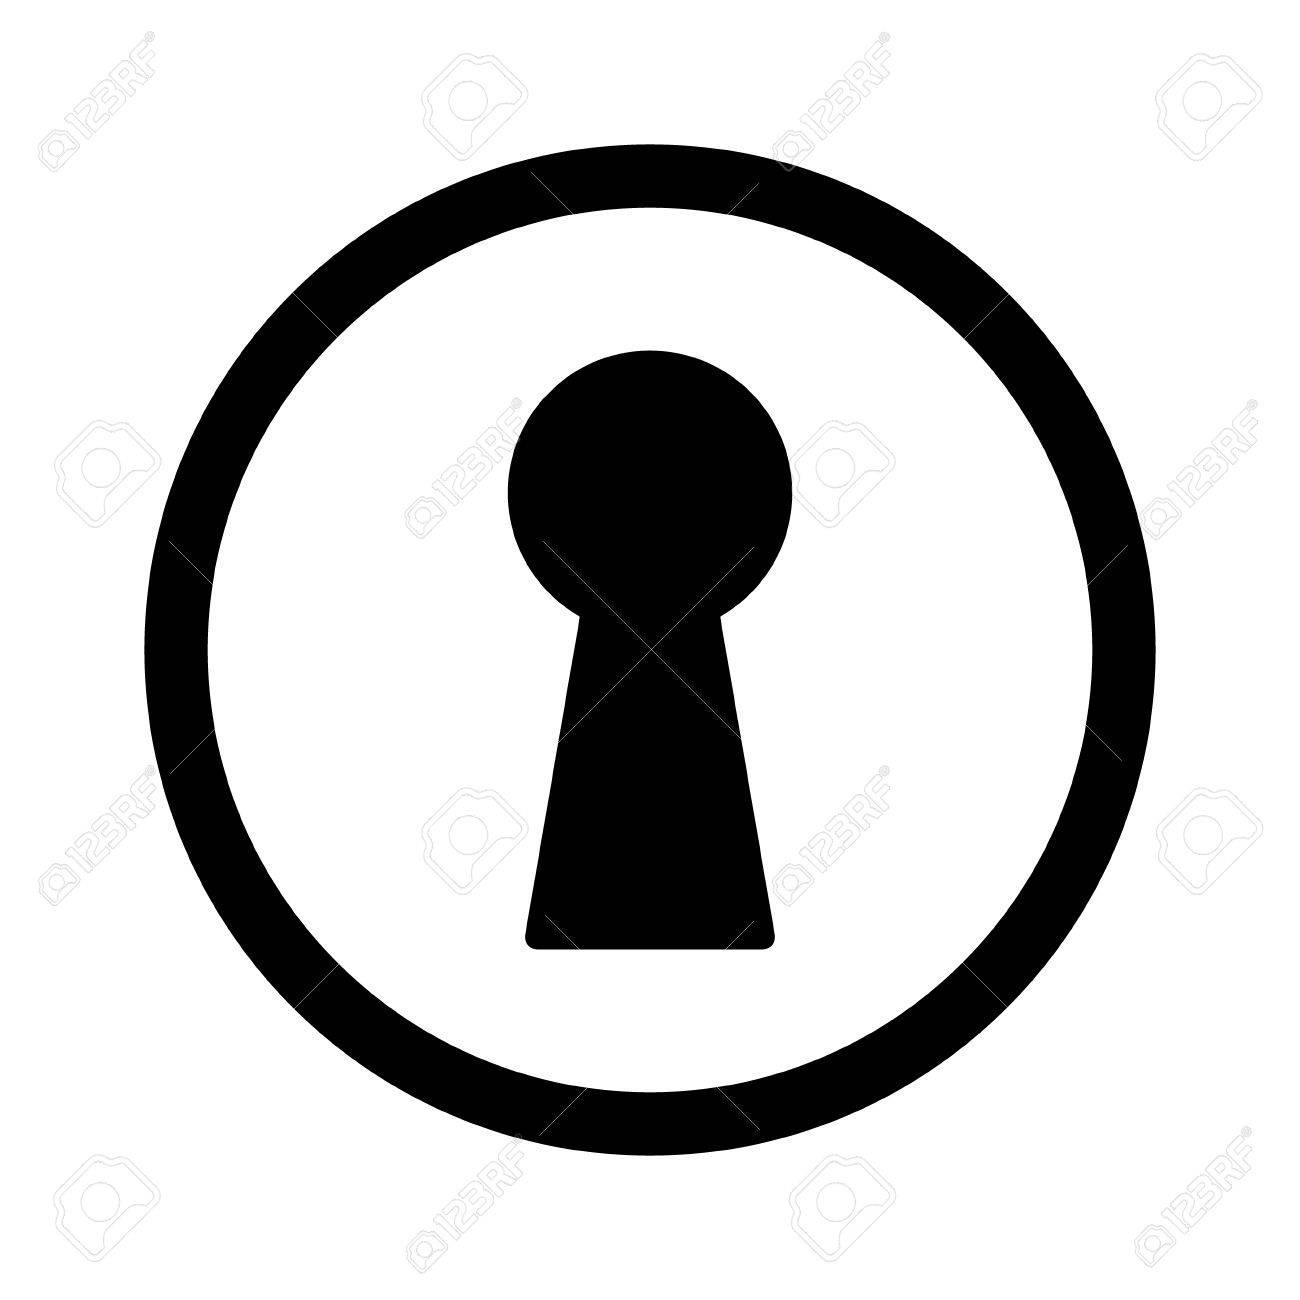 vintage door keyhole access line art icon for apps and websites rh 123rf com key in keyhole vector keyhole vector illustration